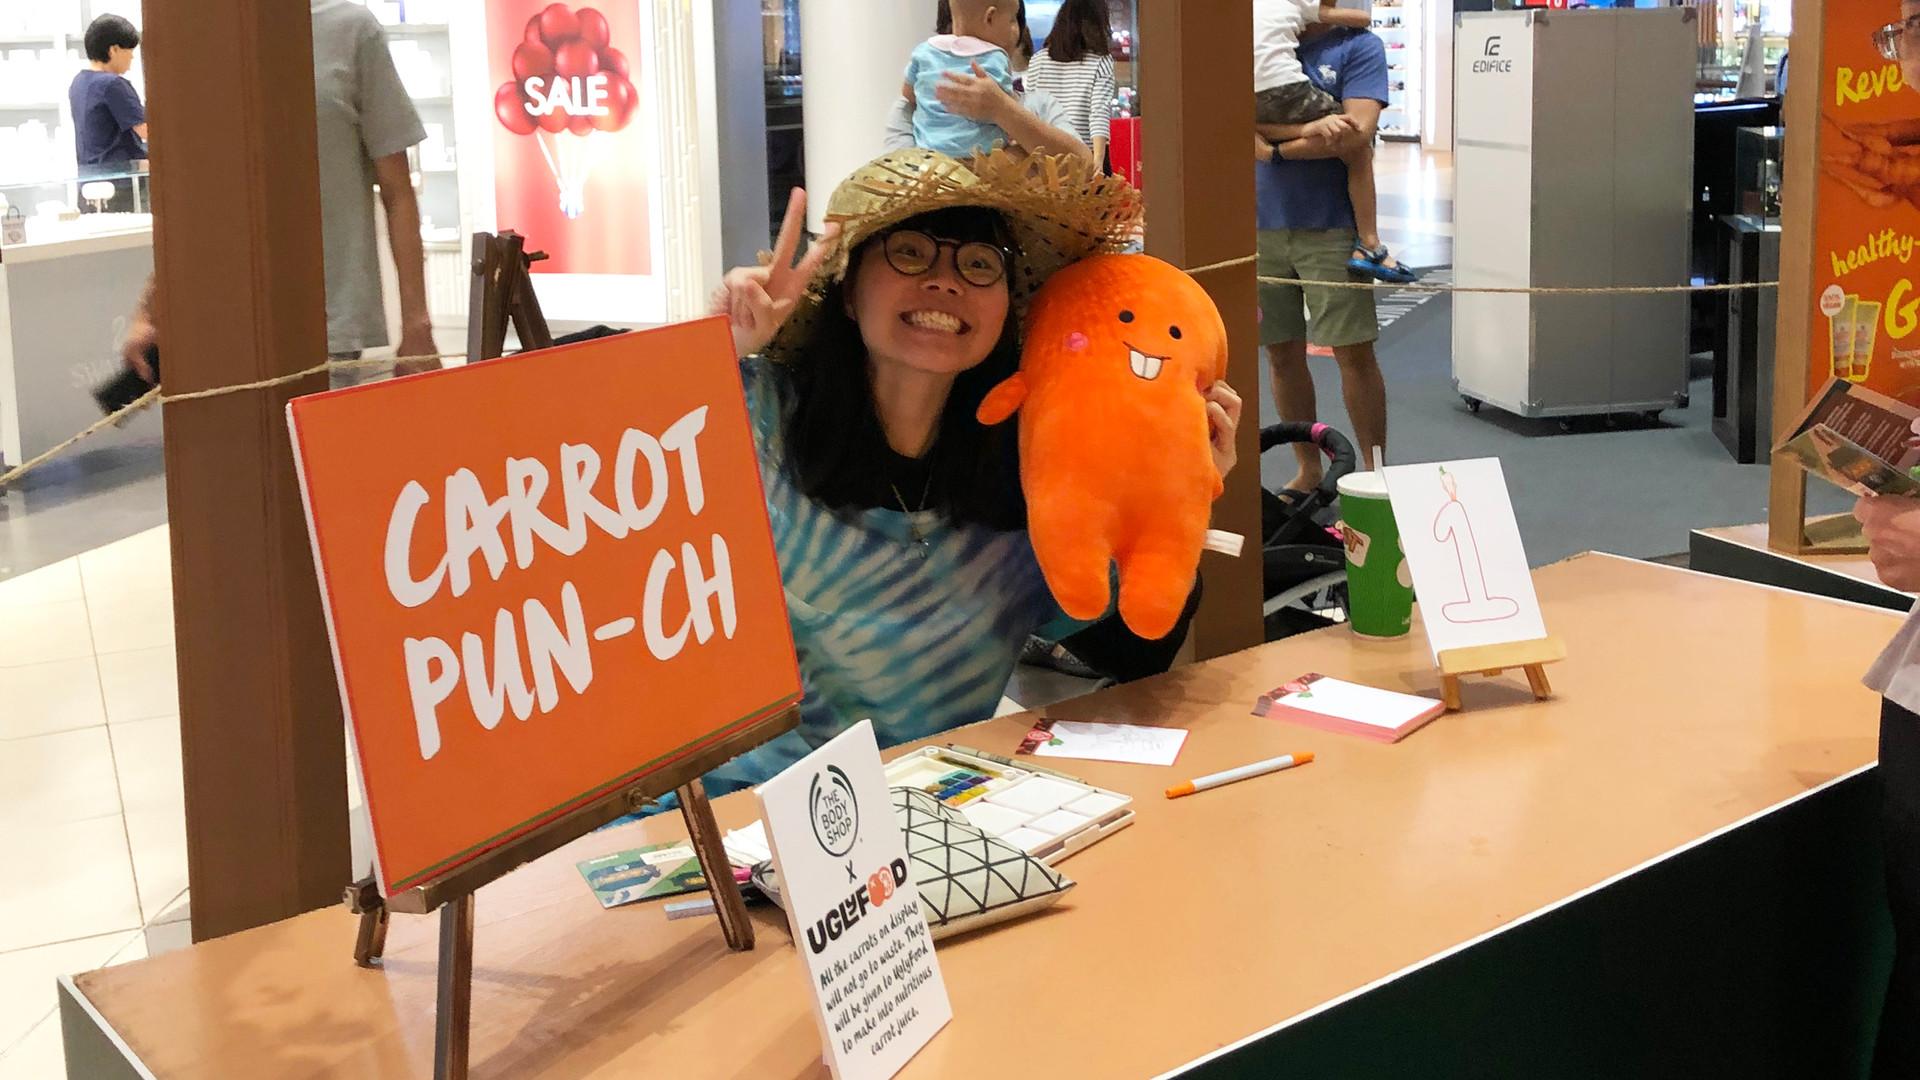 My Carrot Pun-ch Station